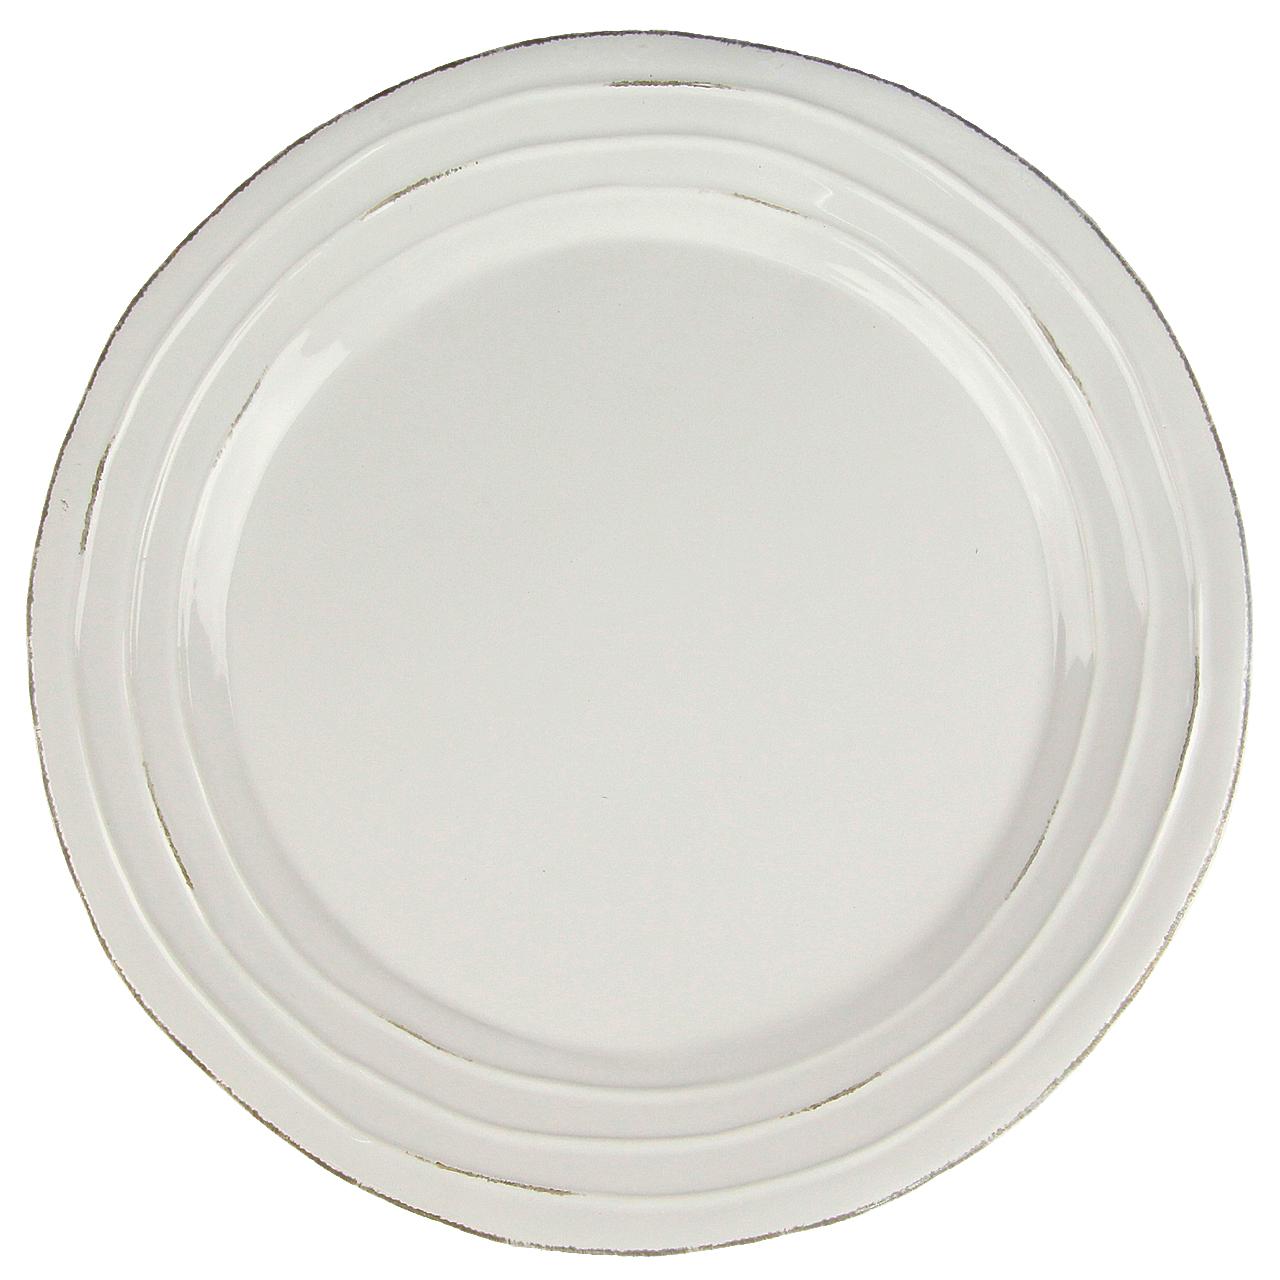 Farfurie Din Ceramica Alba